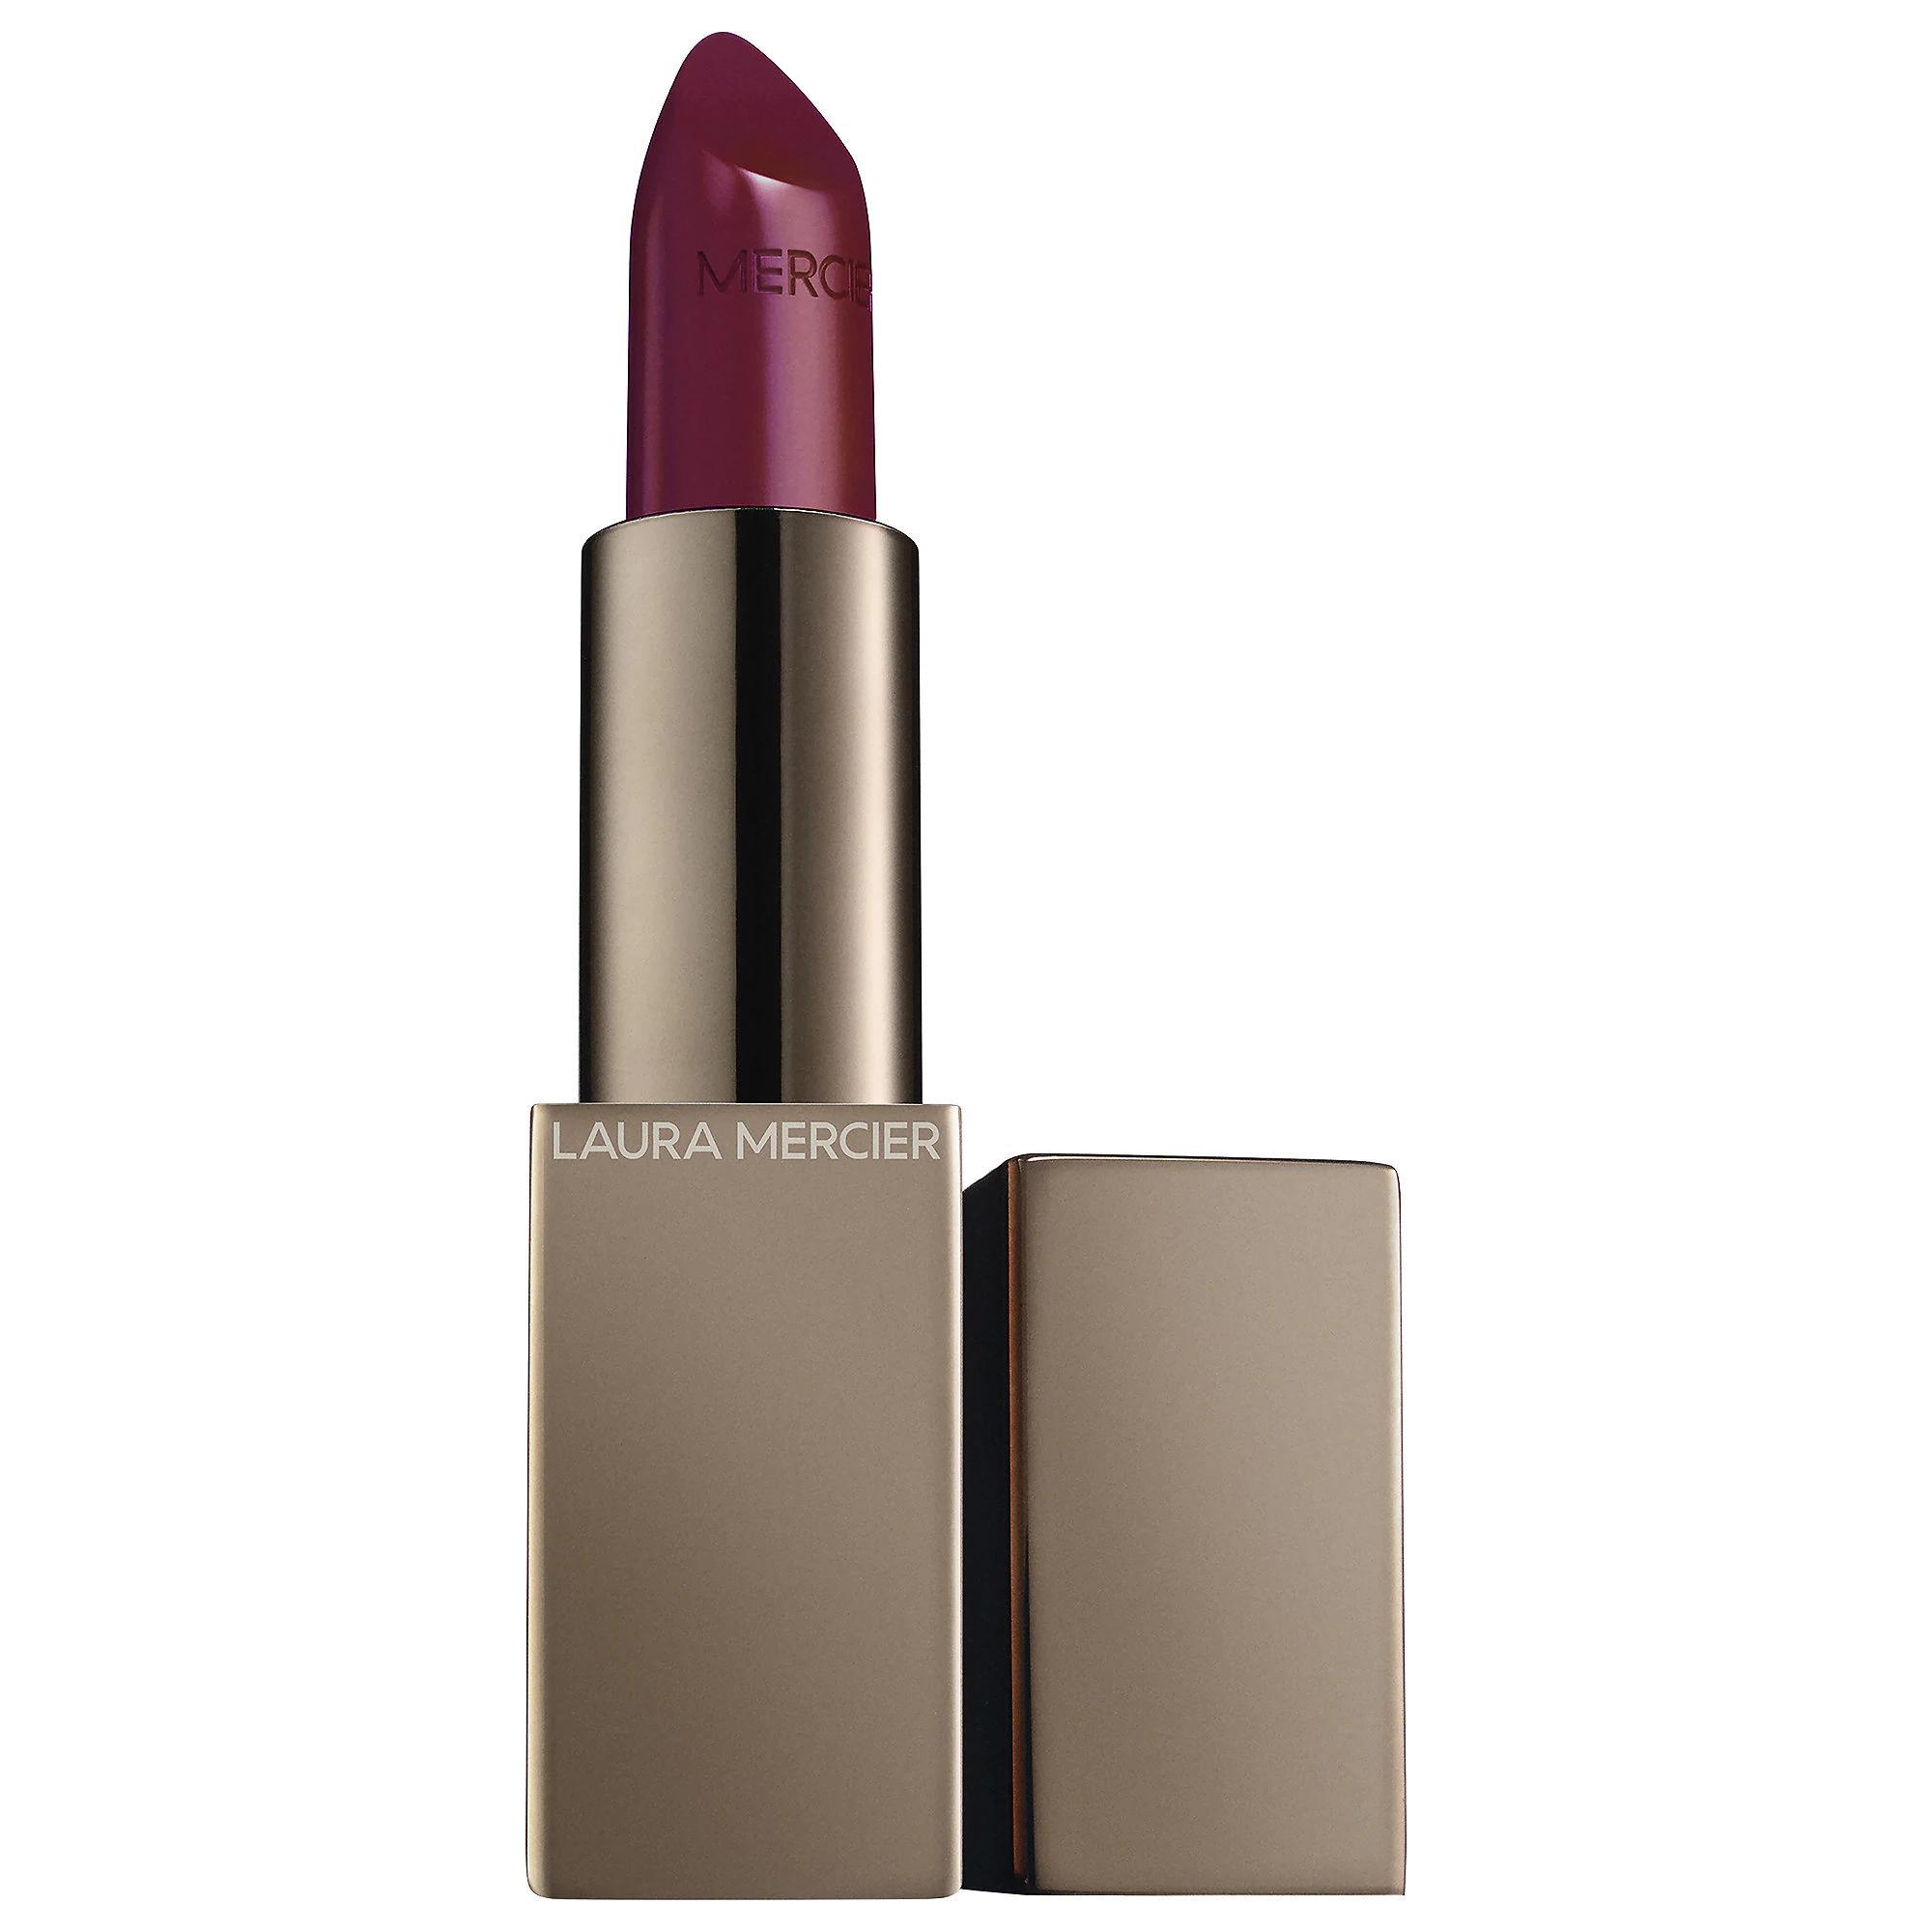 Laura Mercier Rouge Essentiel Silky Creme Lipstick Rose Rouge